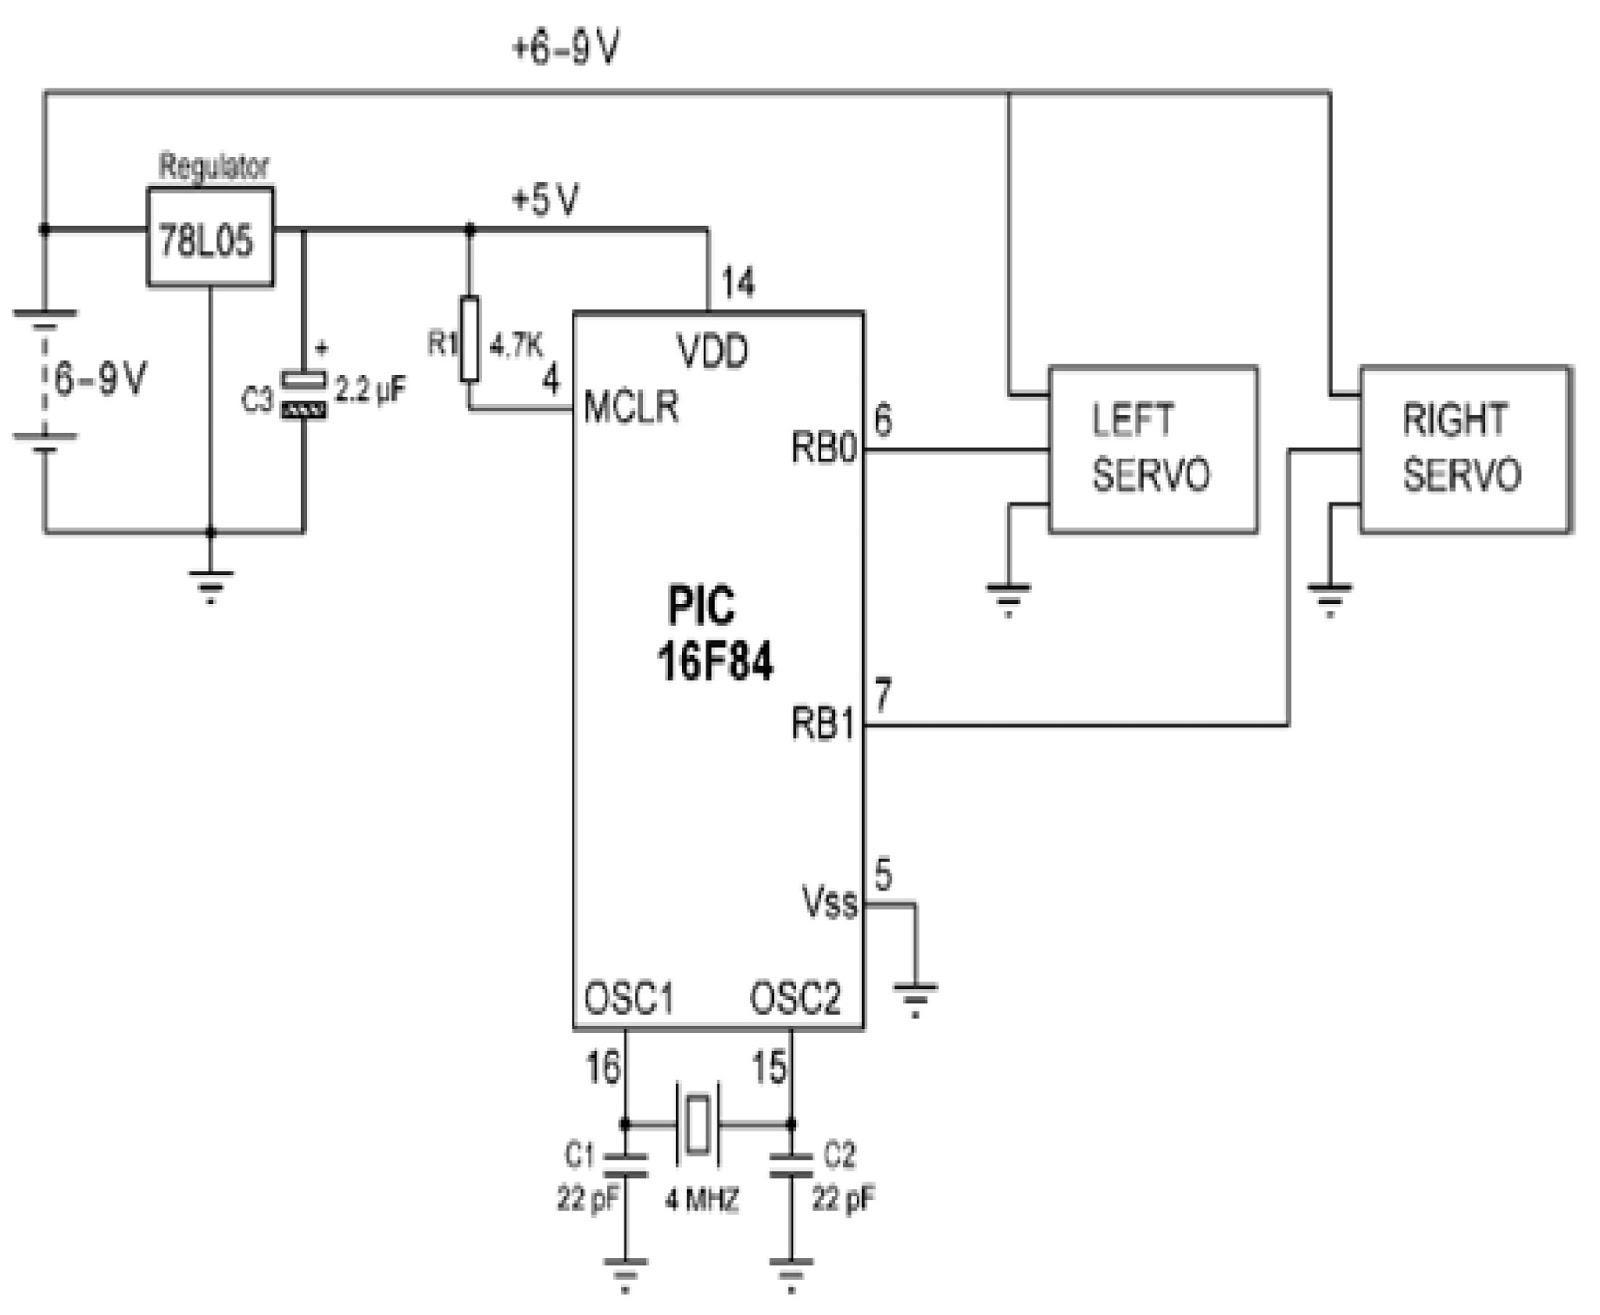 Electroidware Servomotor Based Mobile Robot Control